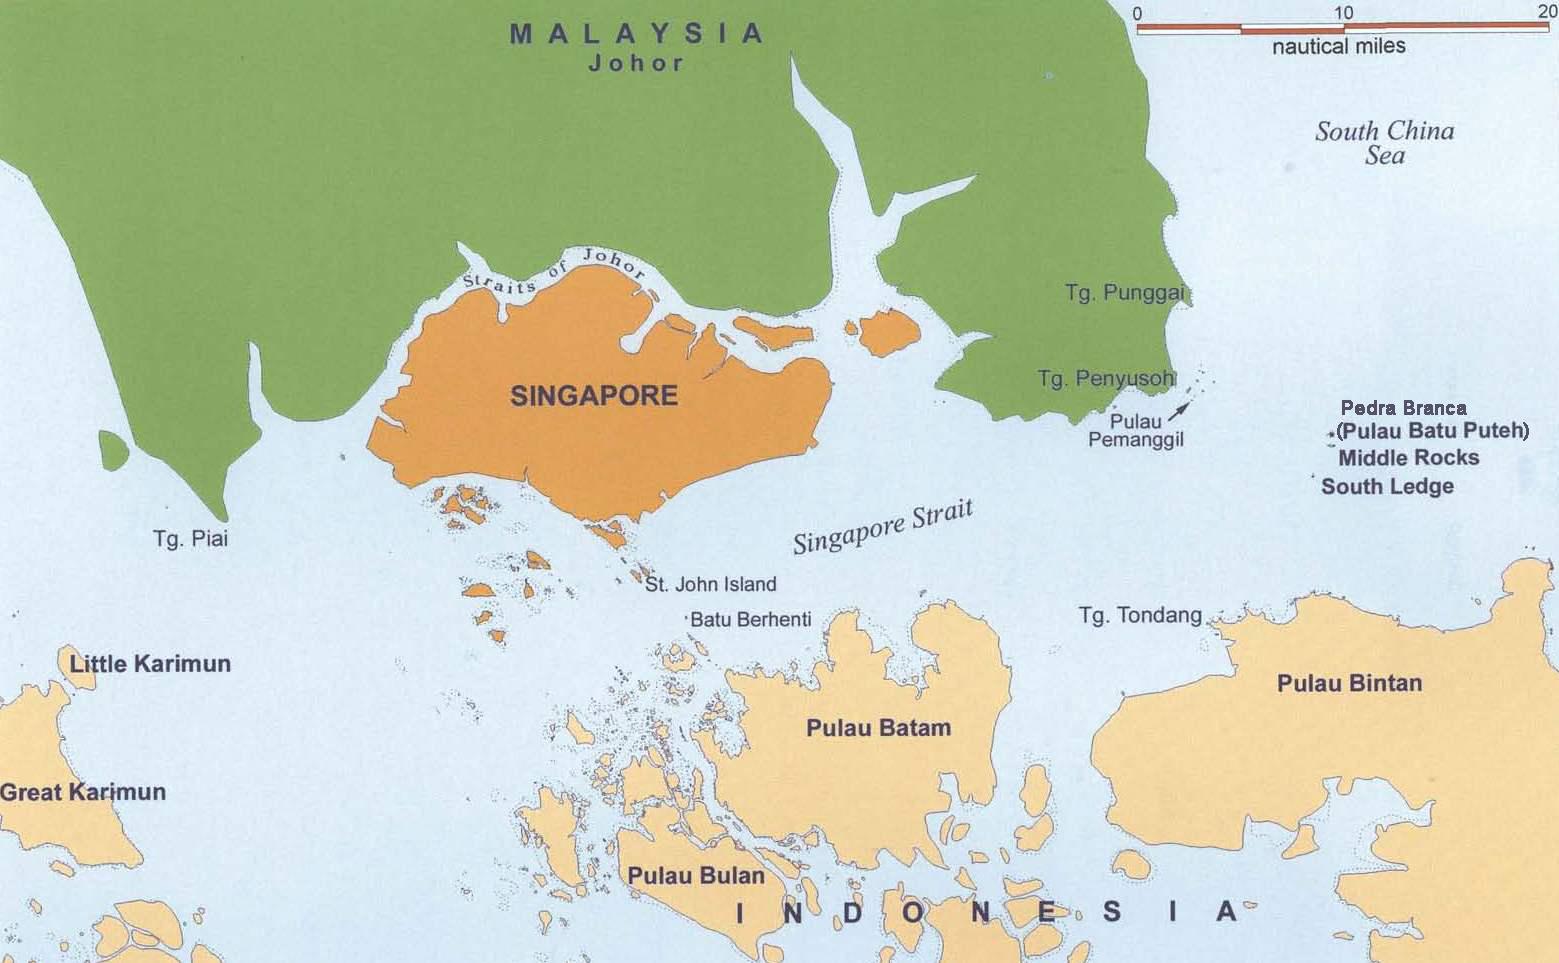 Batam: Singapore's shipping rival less than 30km away